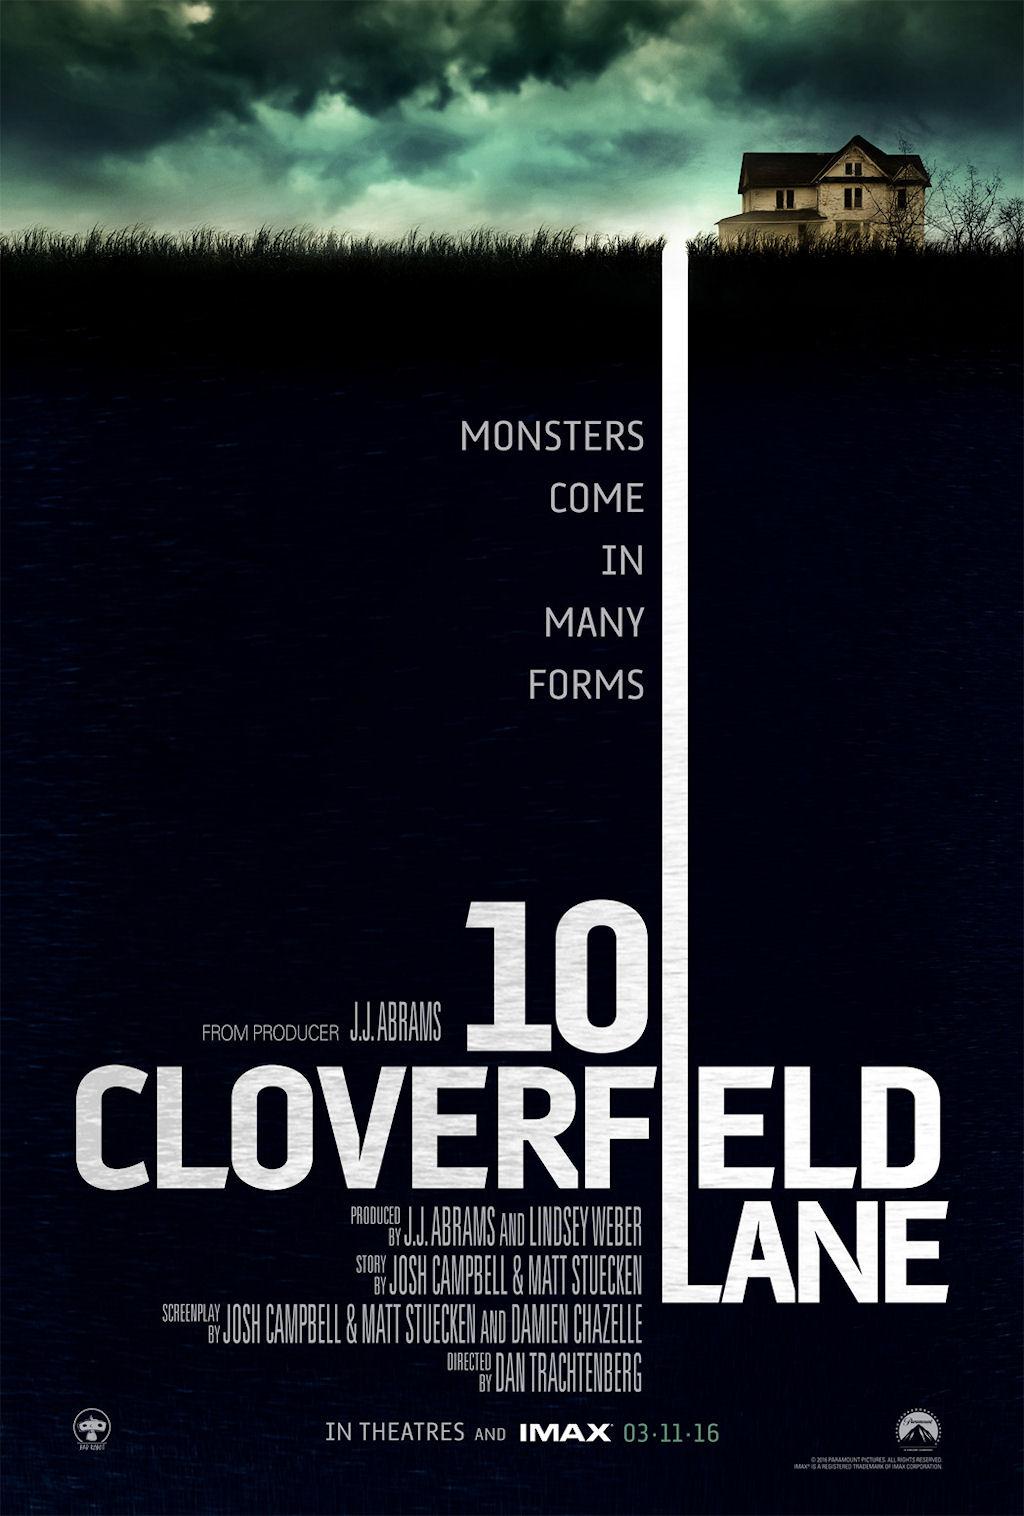 ten-cloverfield-lane-movie-poster.jpg